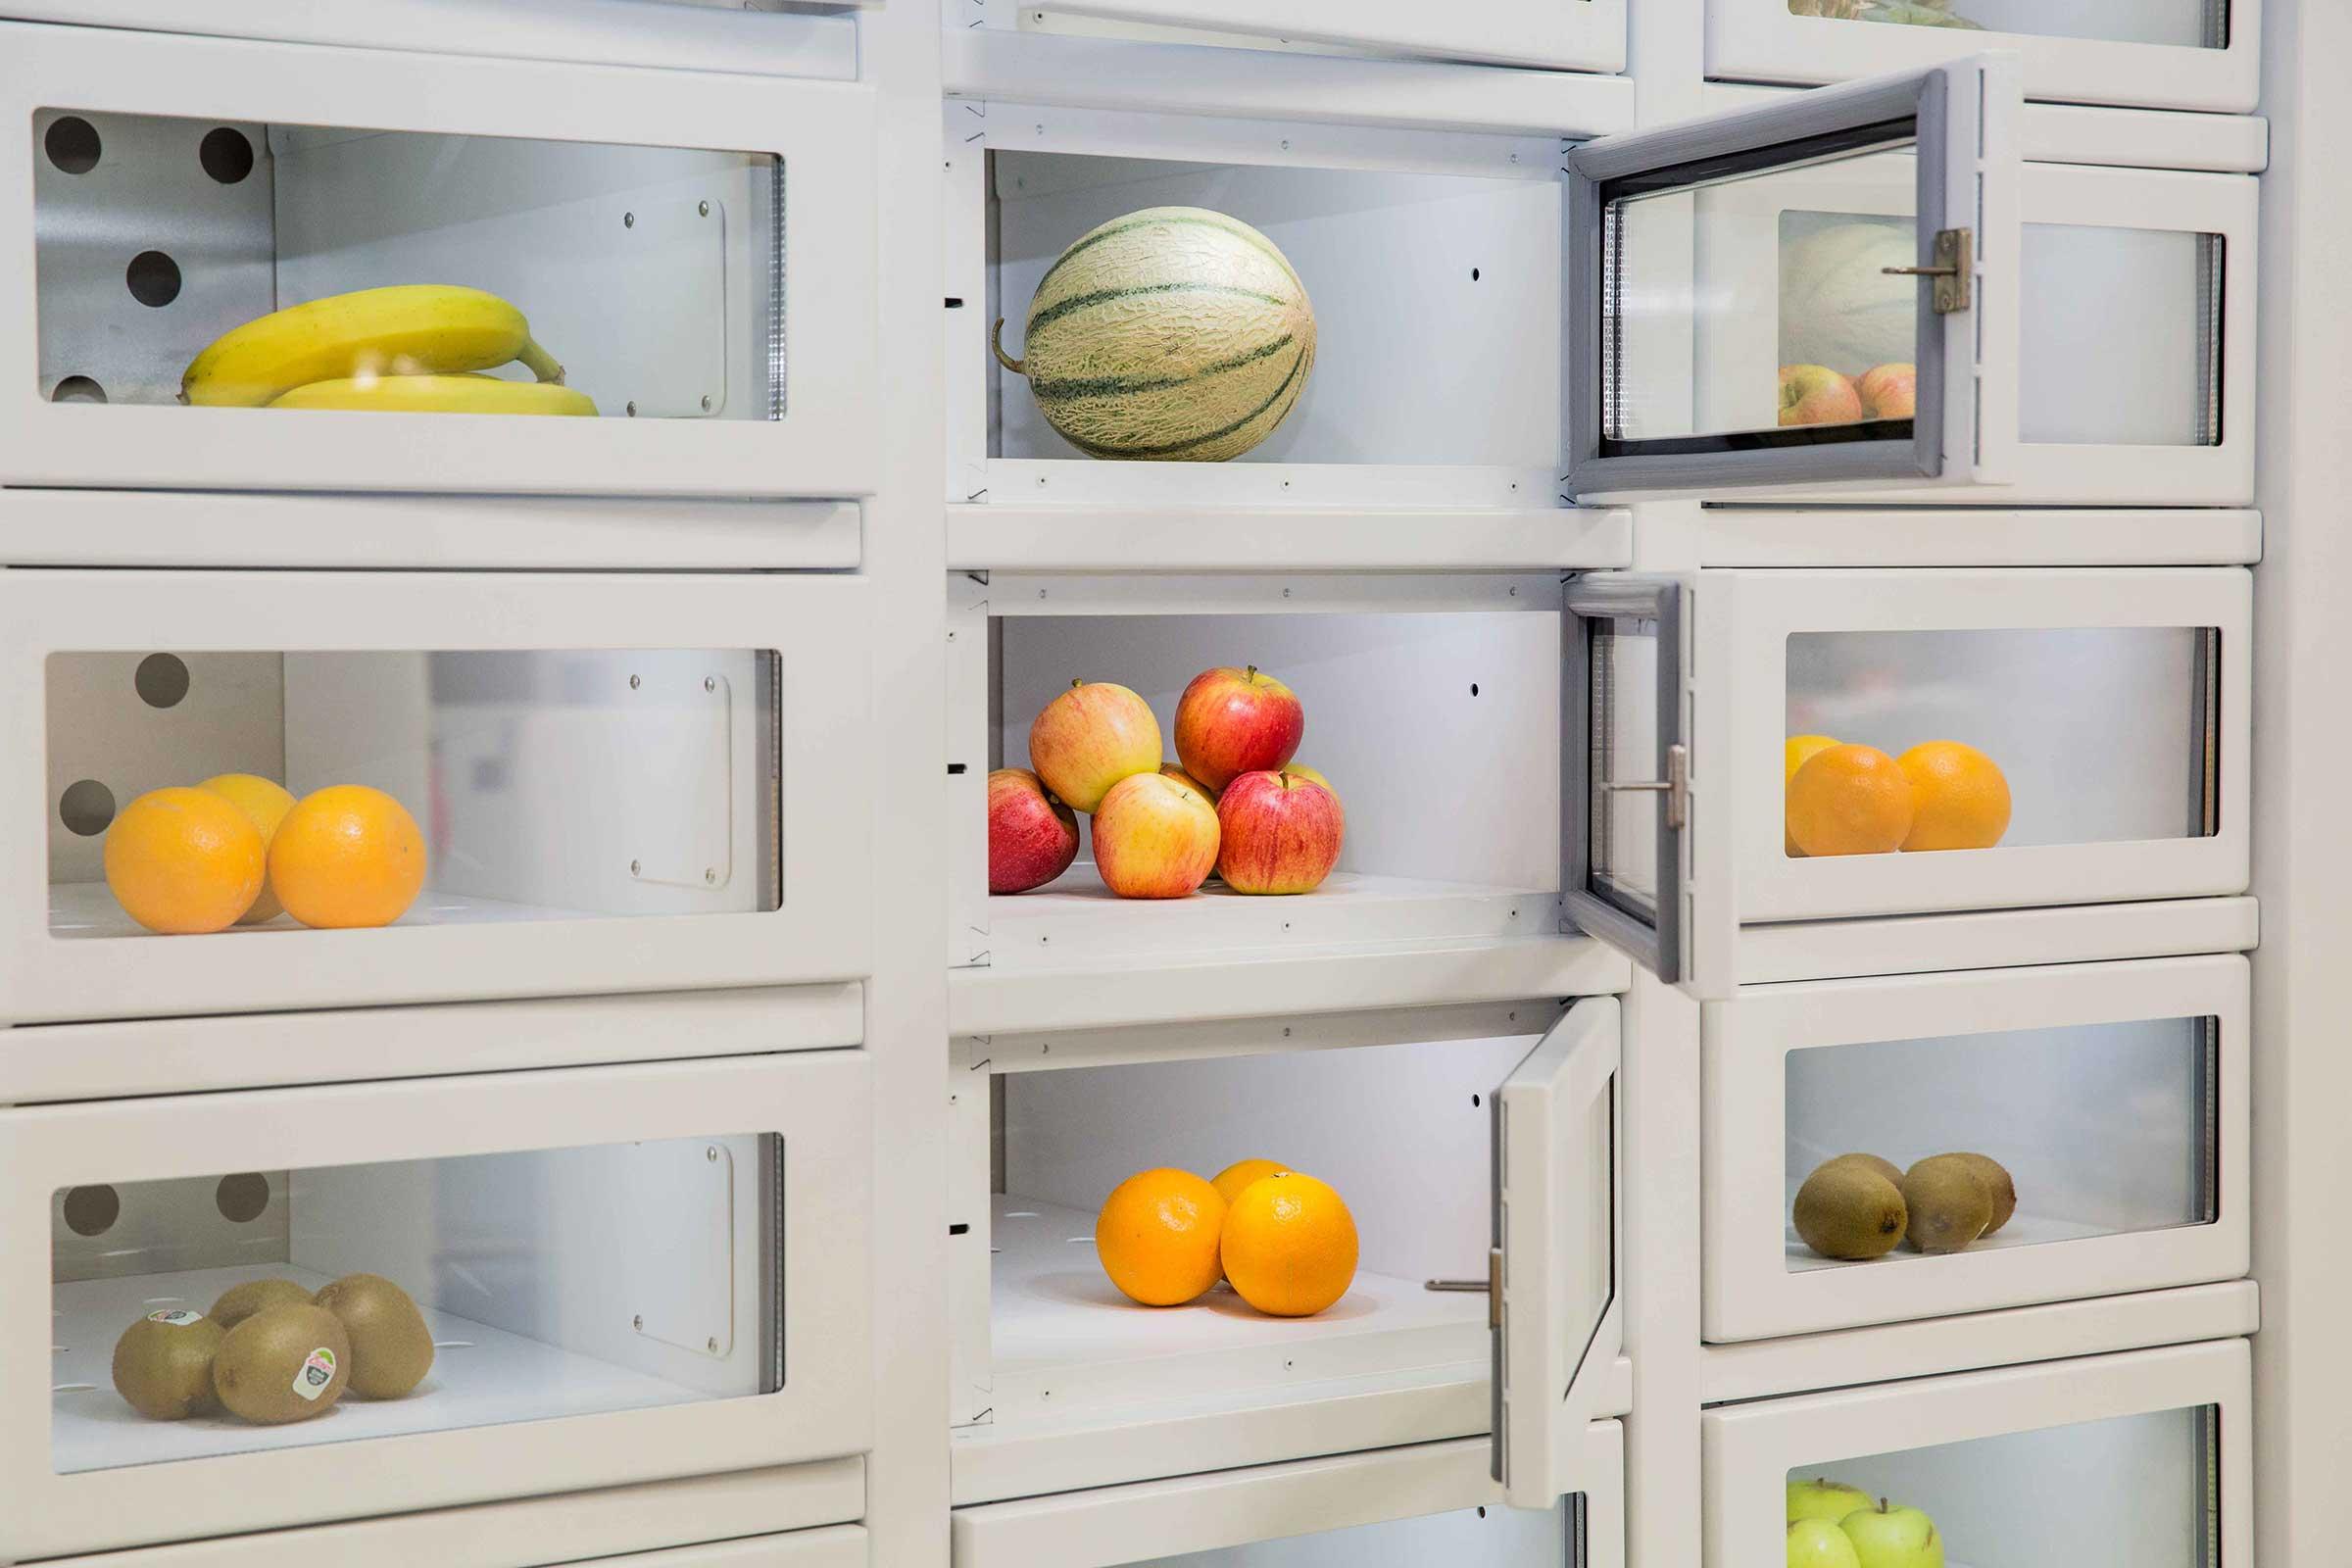 Fruta en una máquina expendedora Le Casier Français